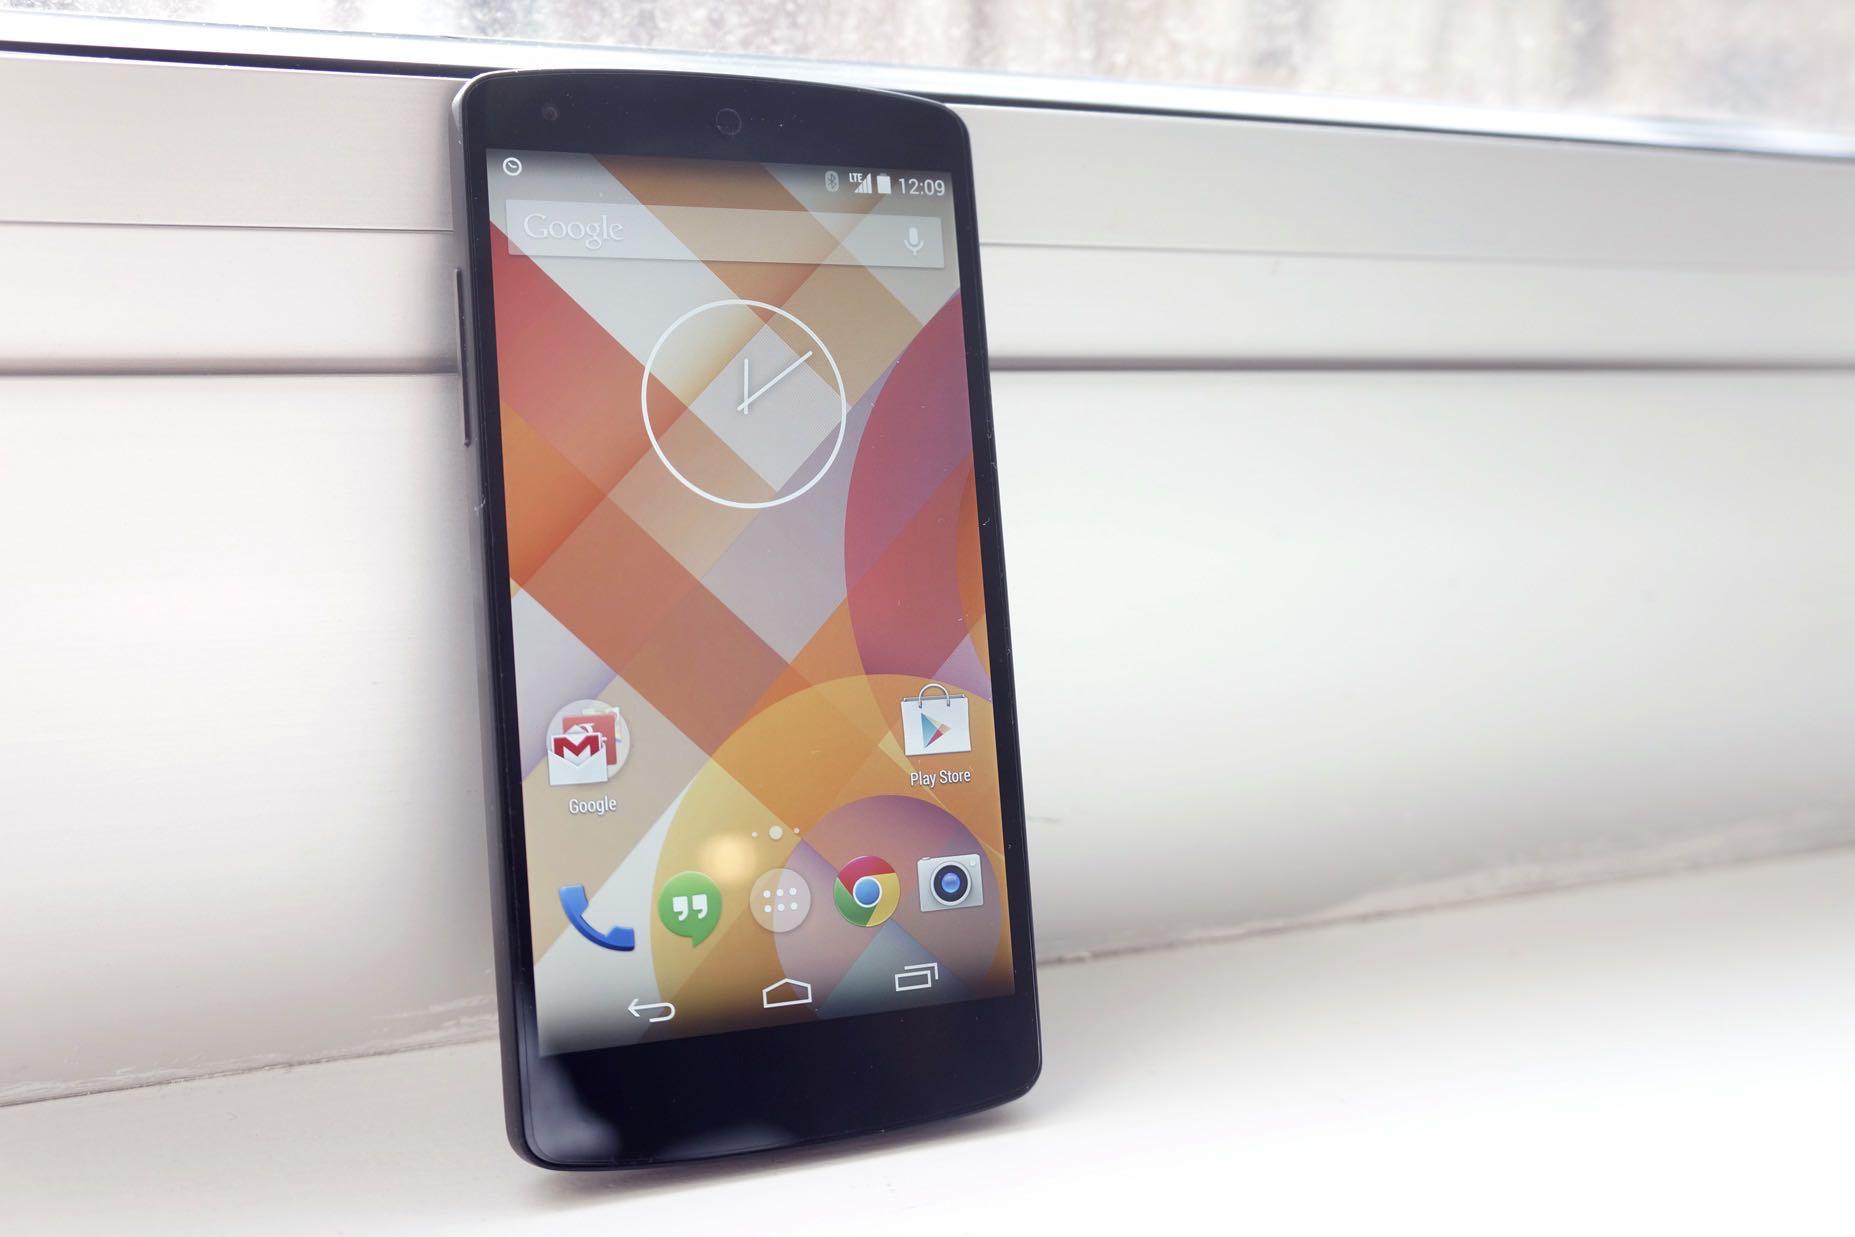 Google LG Nexus 5 Android 7.1.1 Nougat Download XDA 3